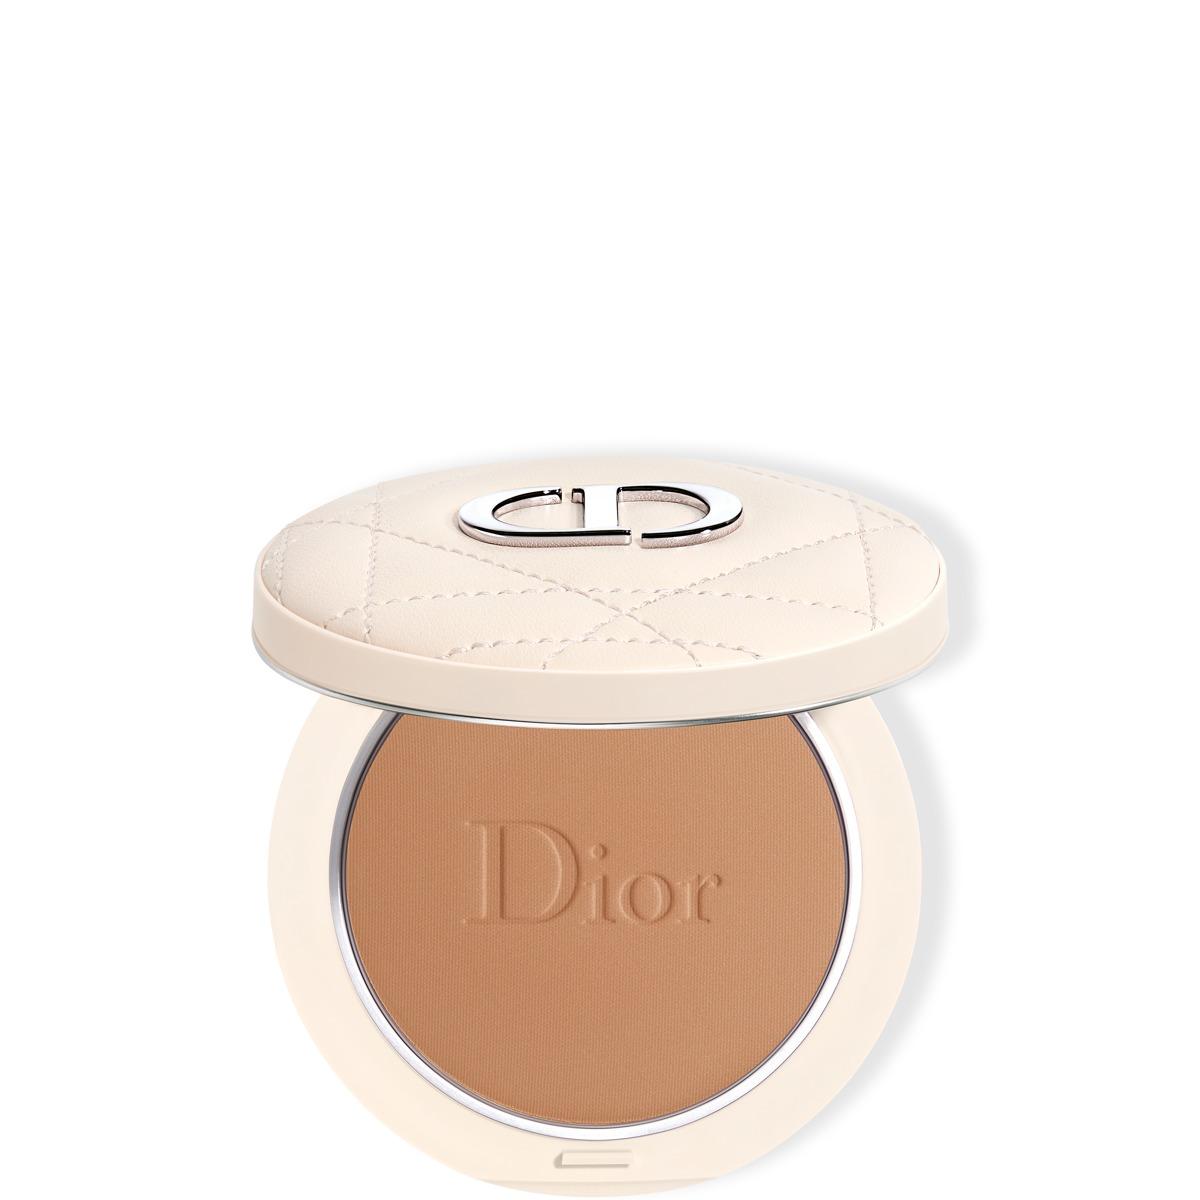 Dior Forever Natural Bronze - Poudre bronzer